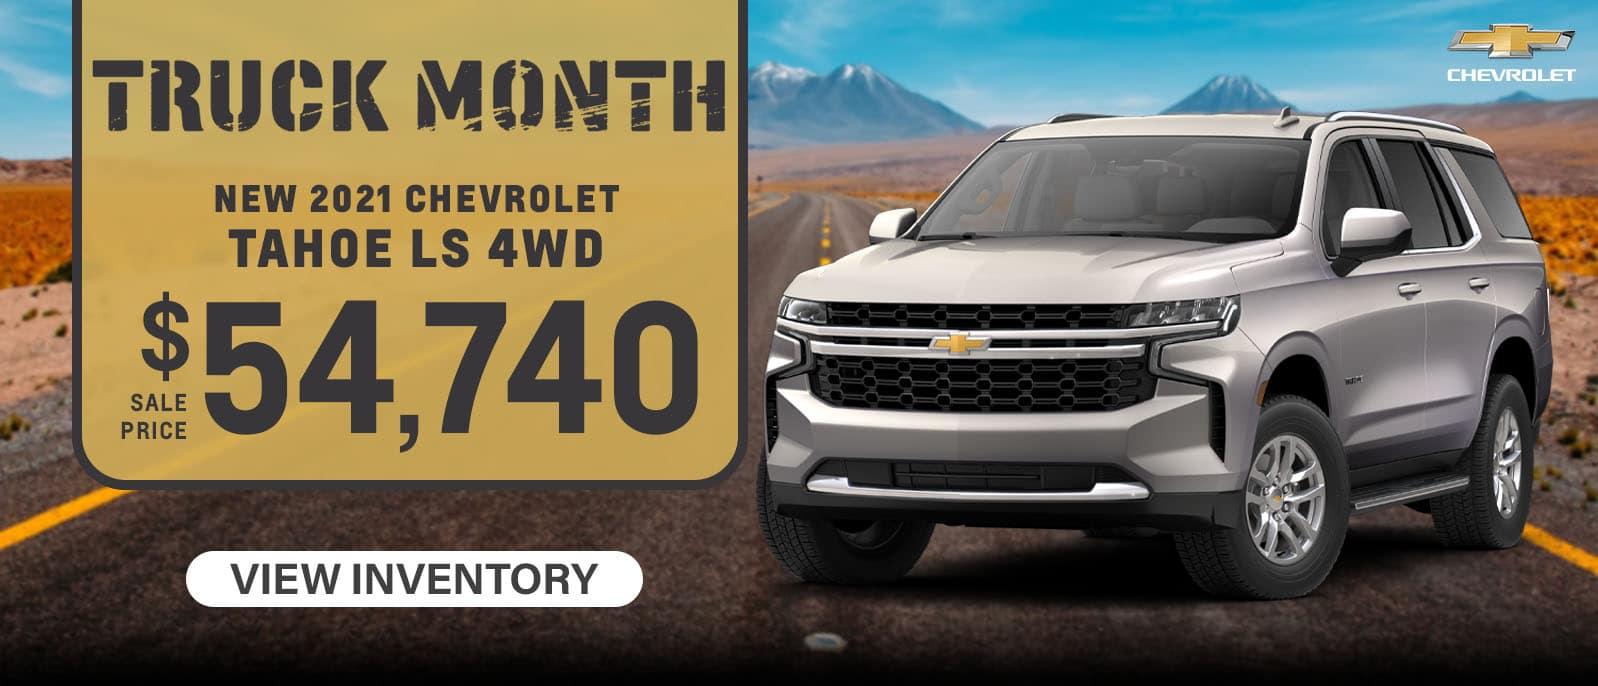 CRCH-October 2021-2021 Chevrolet Tahoe copy